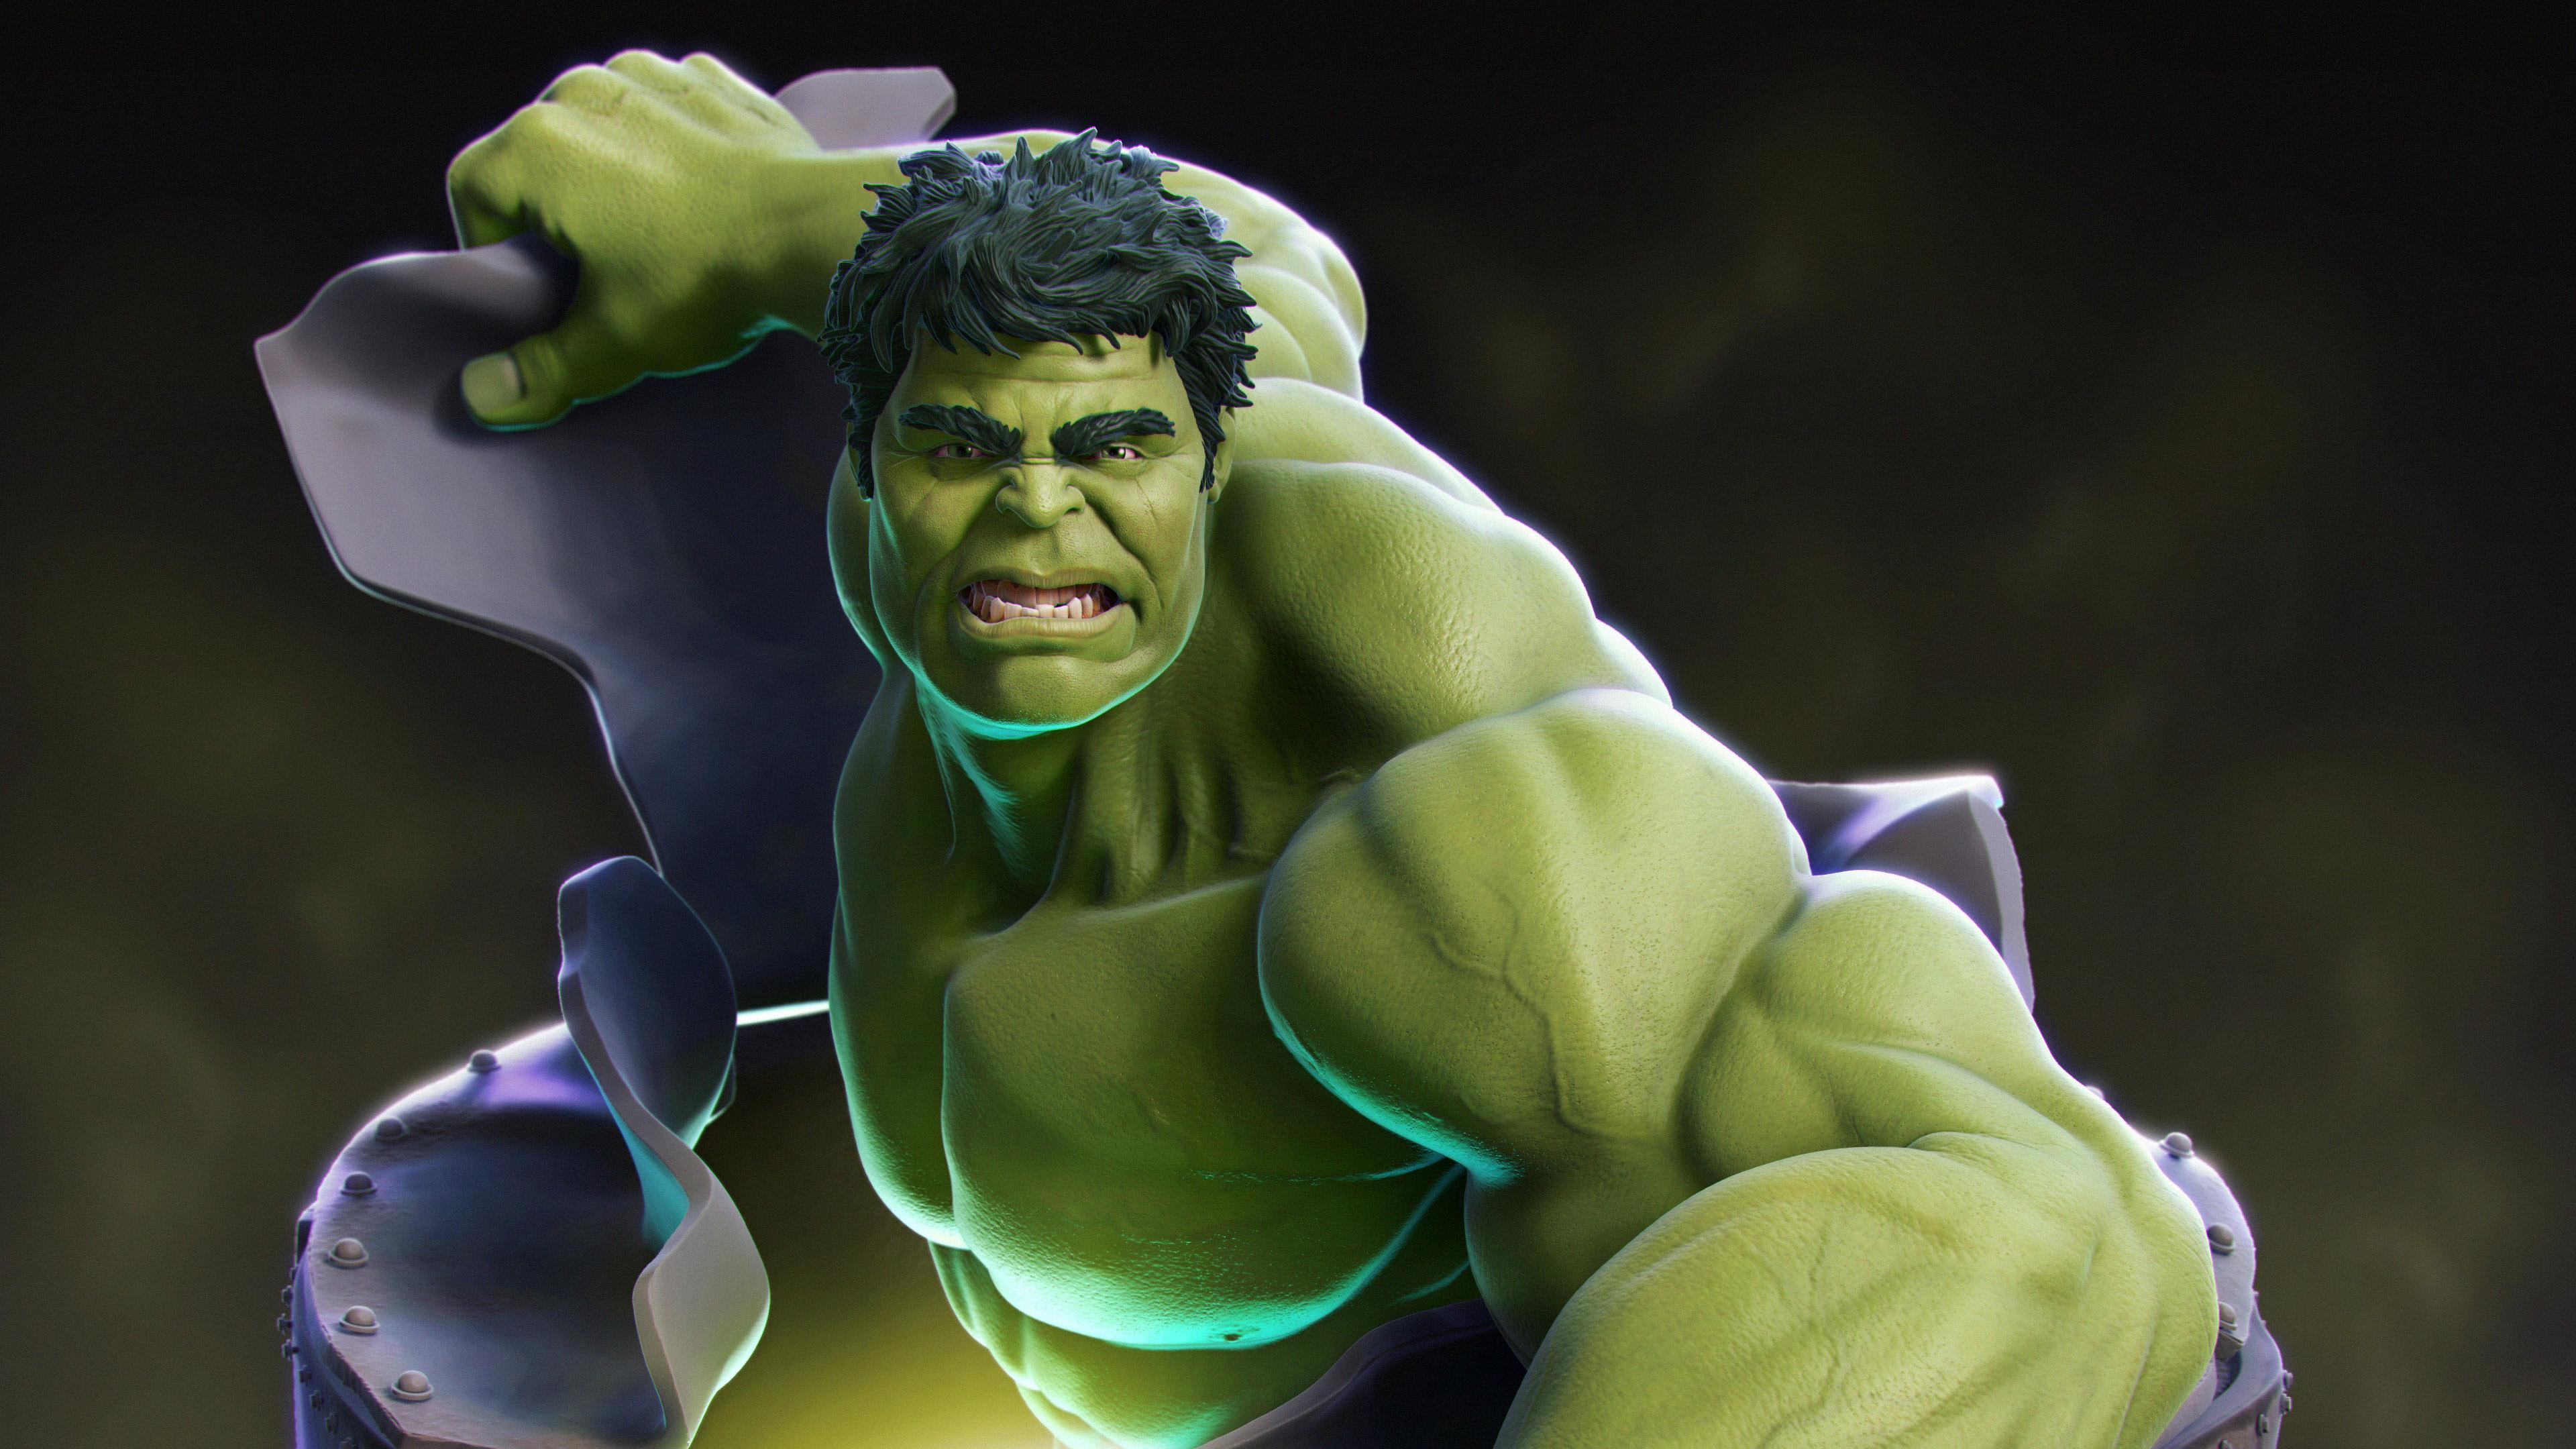 hulk cgi 4k 1544923153 - Hulk CGI 4K - superheroes wallpapers, hulk wallpapers, hd-wallpapers, digital art wallpapers, cgi wallpapers, behance wallpapers, artwork wallpapers, 4k-wallpapers